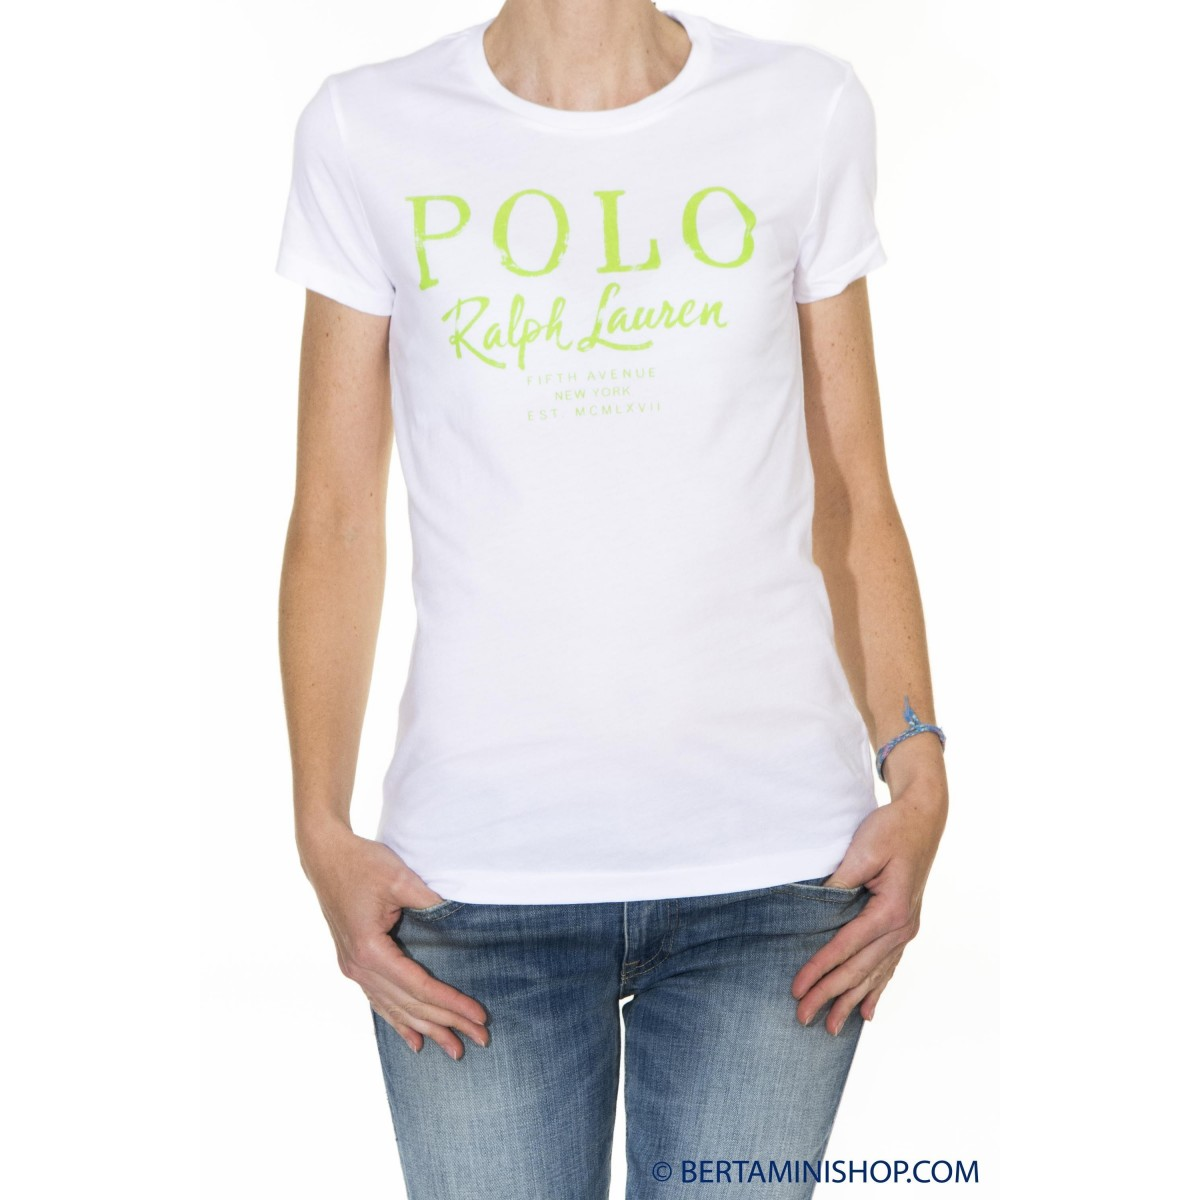 T-shirt donna Ralph lauren - V38ih624bh624 tshirt logo B1H07